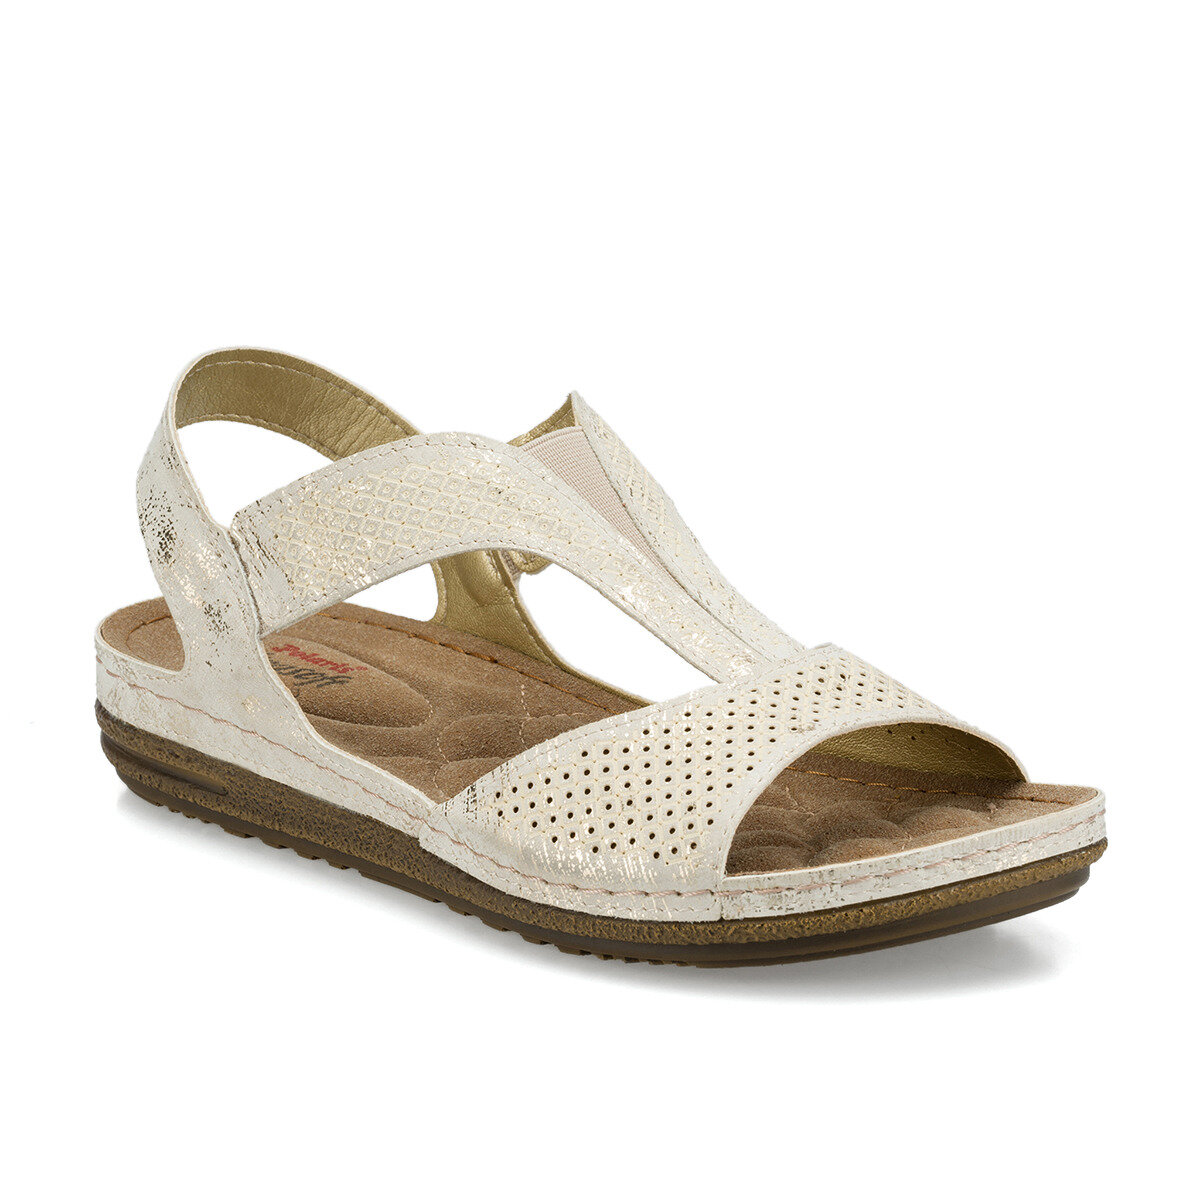 FLO 161163.Z Beige Women 'S Sandals Polaris